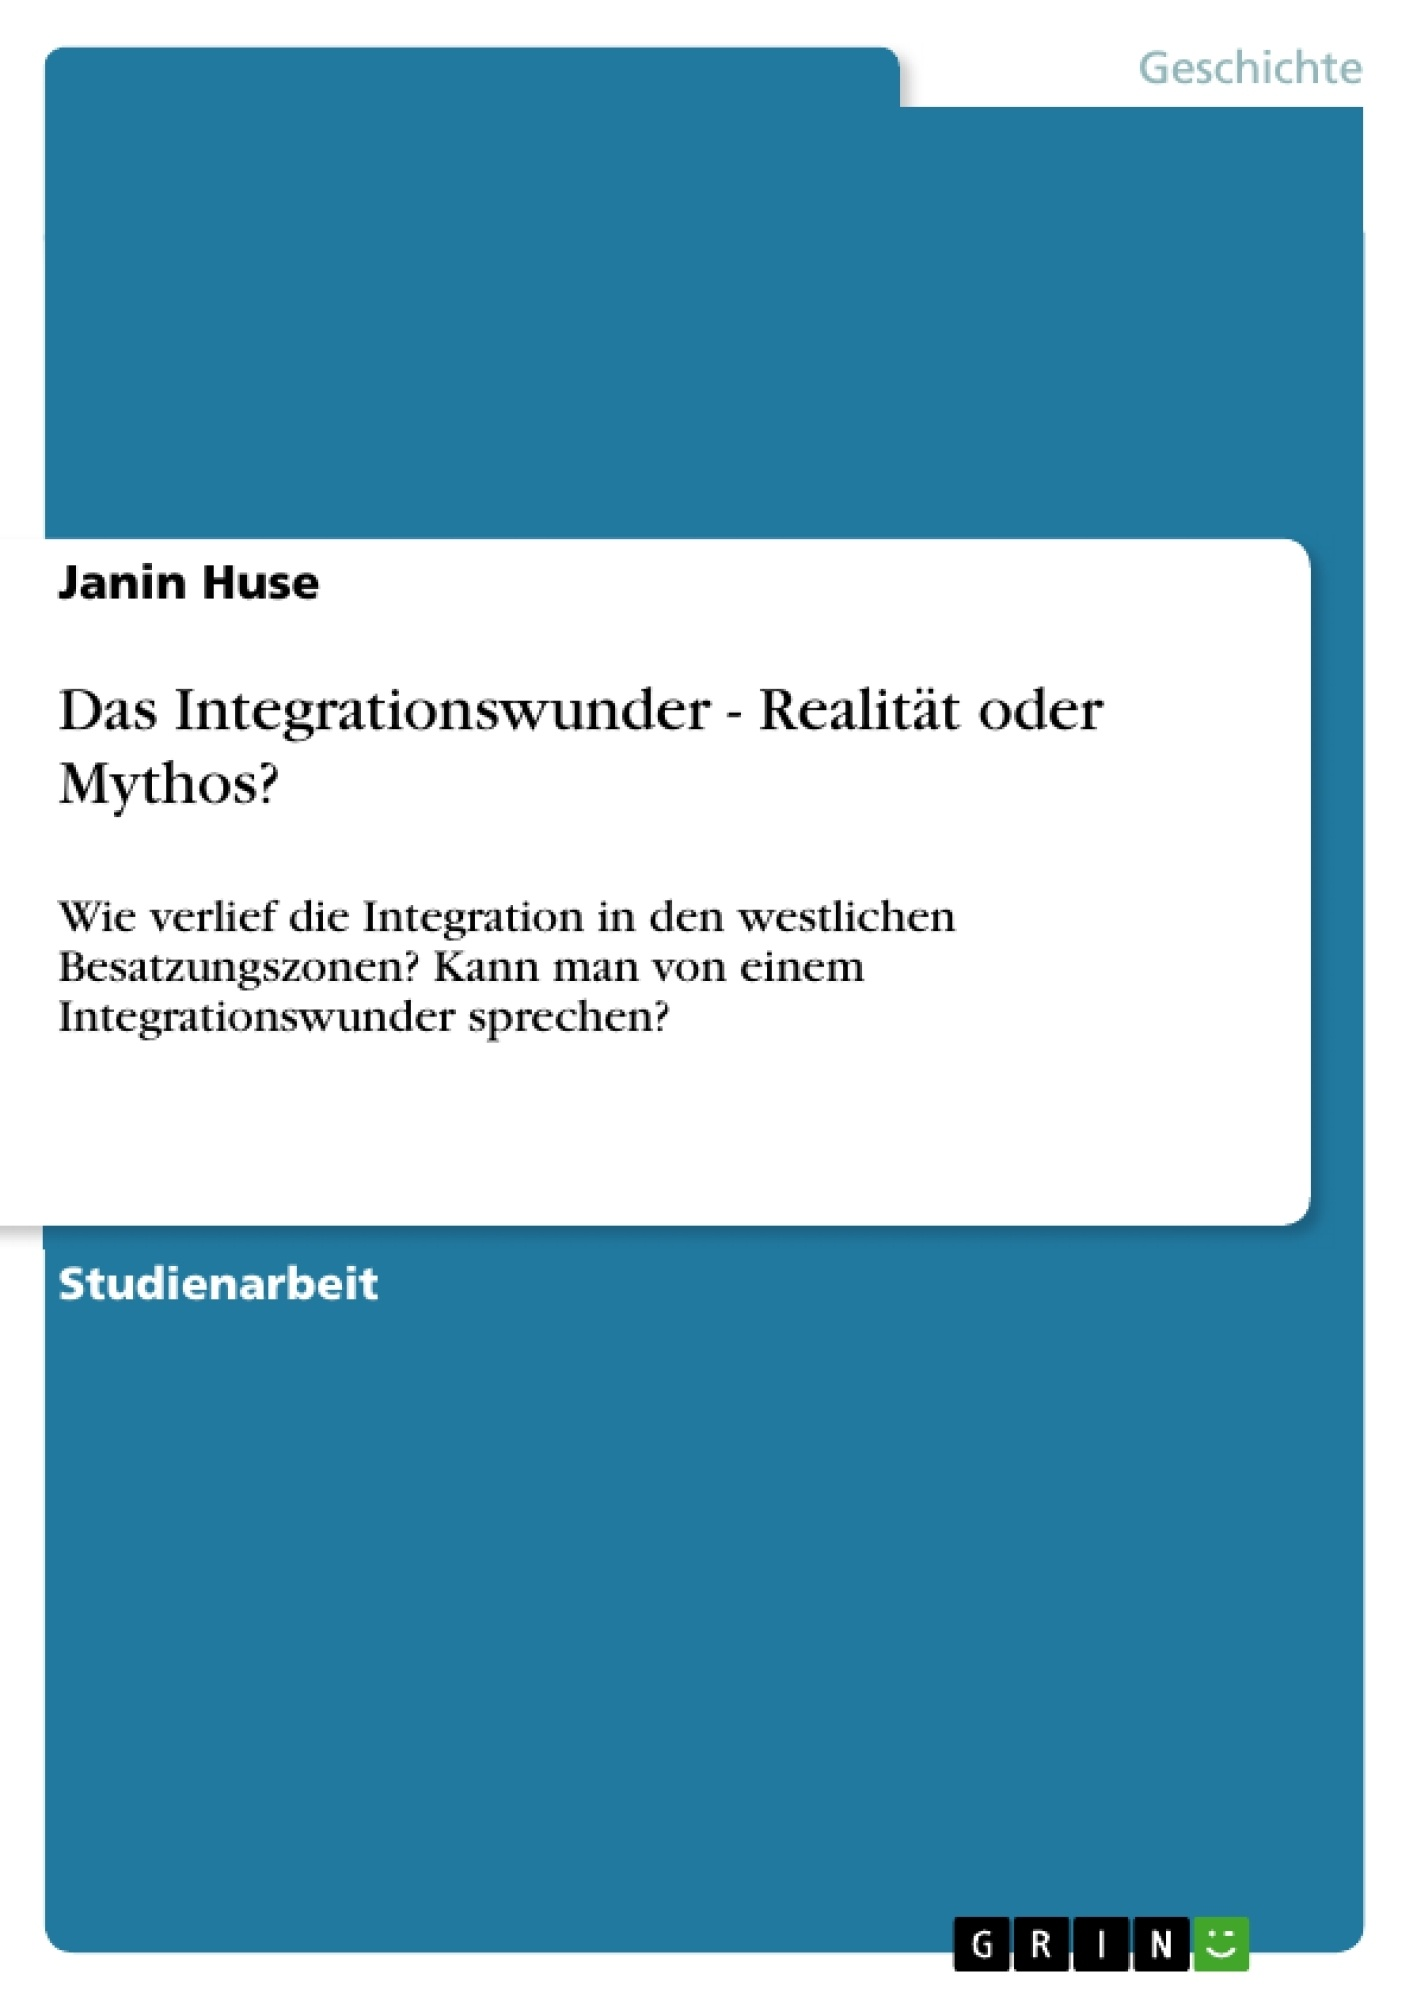 Titel: Das Integrationswunder - Realität oder Mythos?